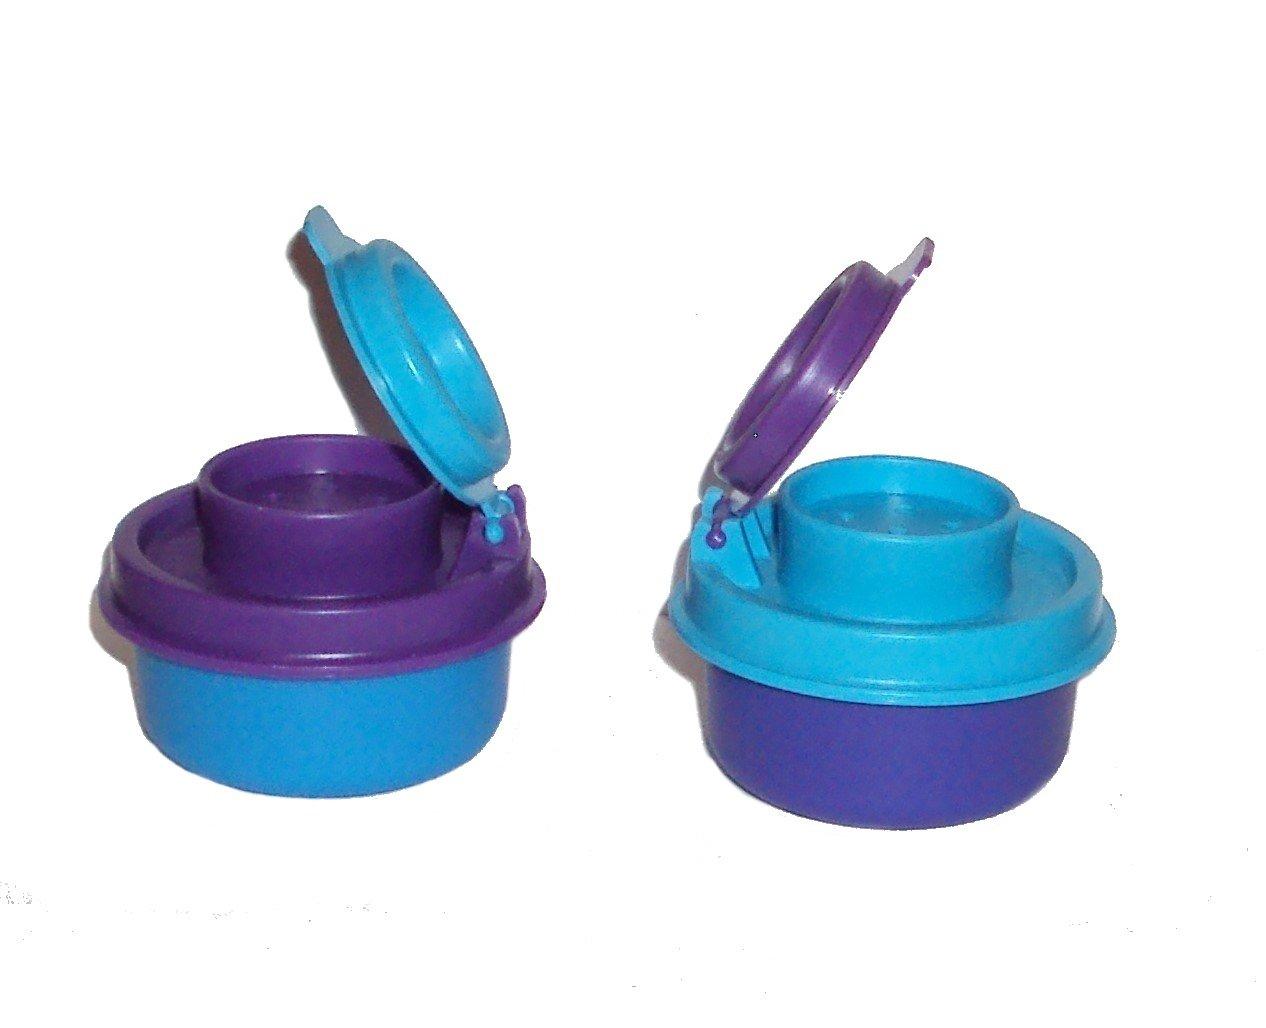 Tupperware Salt & Pepper Smidgets Shakers in Various Colors rdyuipklnm